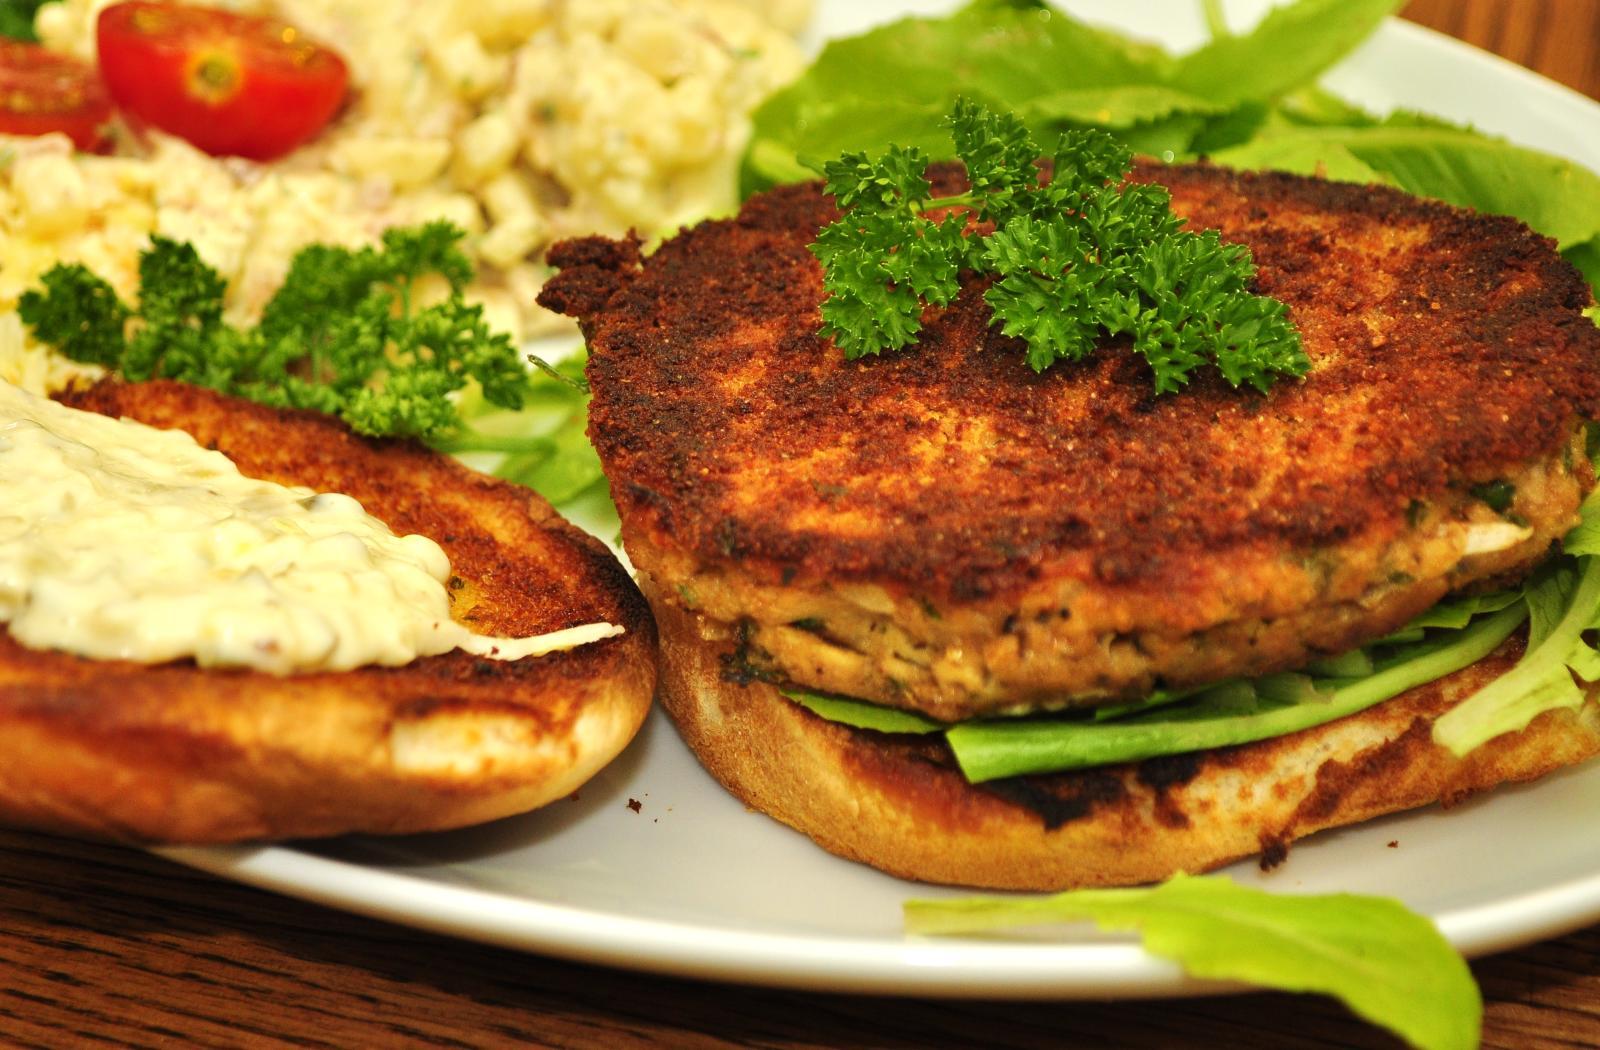 SW recipe: Tuna Burgers